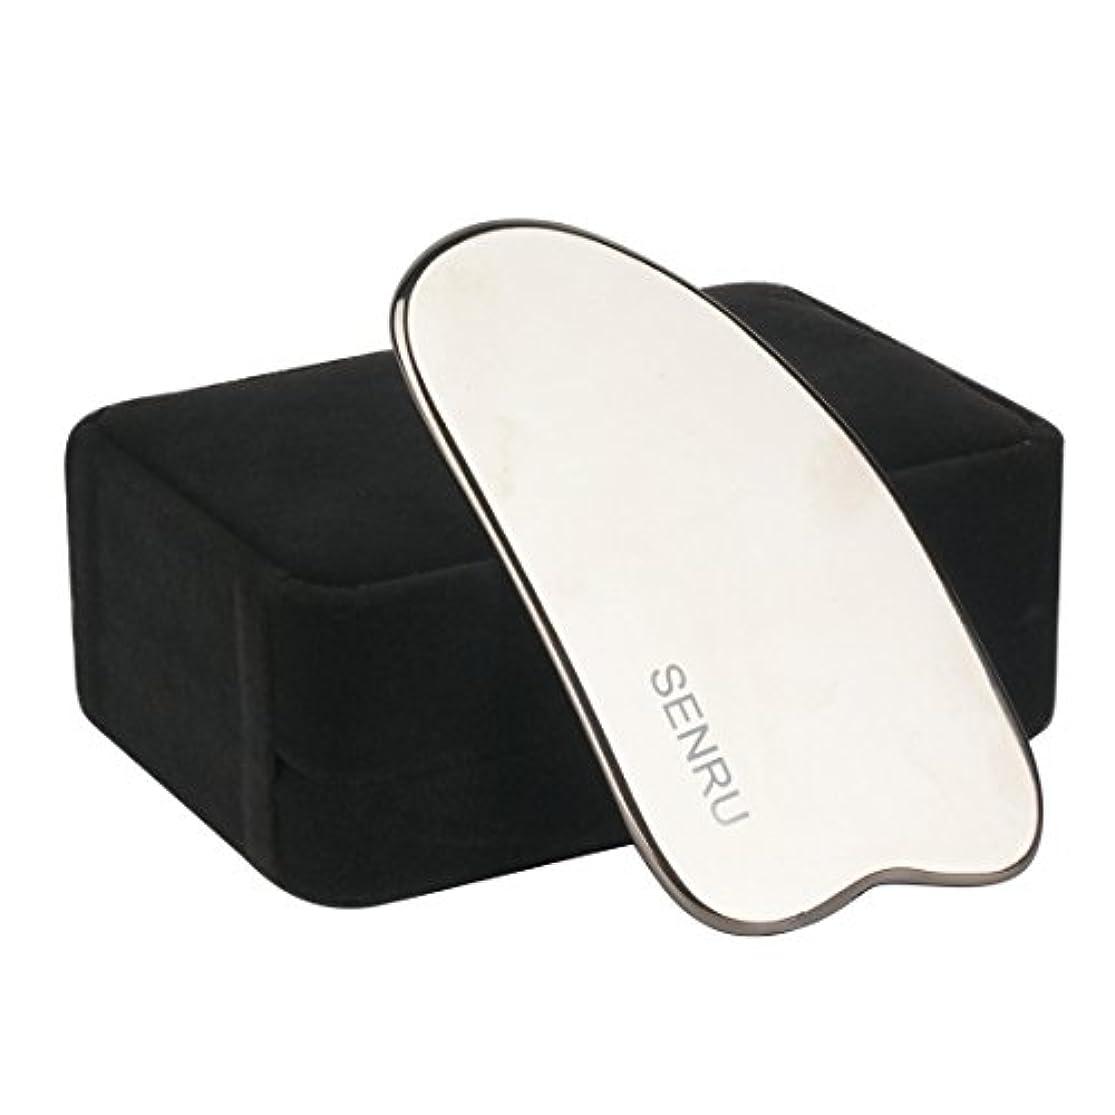 SENRU チタン カッサプレート かっさマッサージ 刮痧 リンパ解毒 全身血行促進 疲れやストレス緩和 専用ケース袋付き